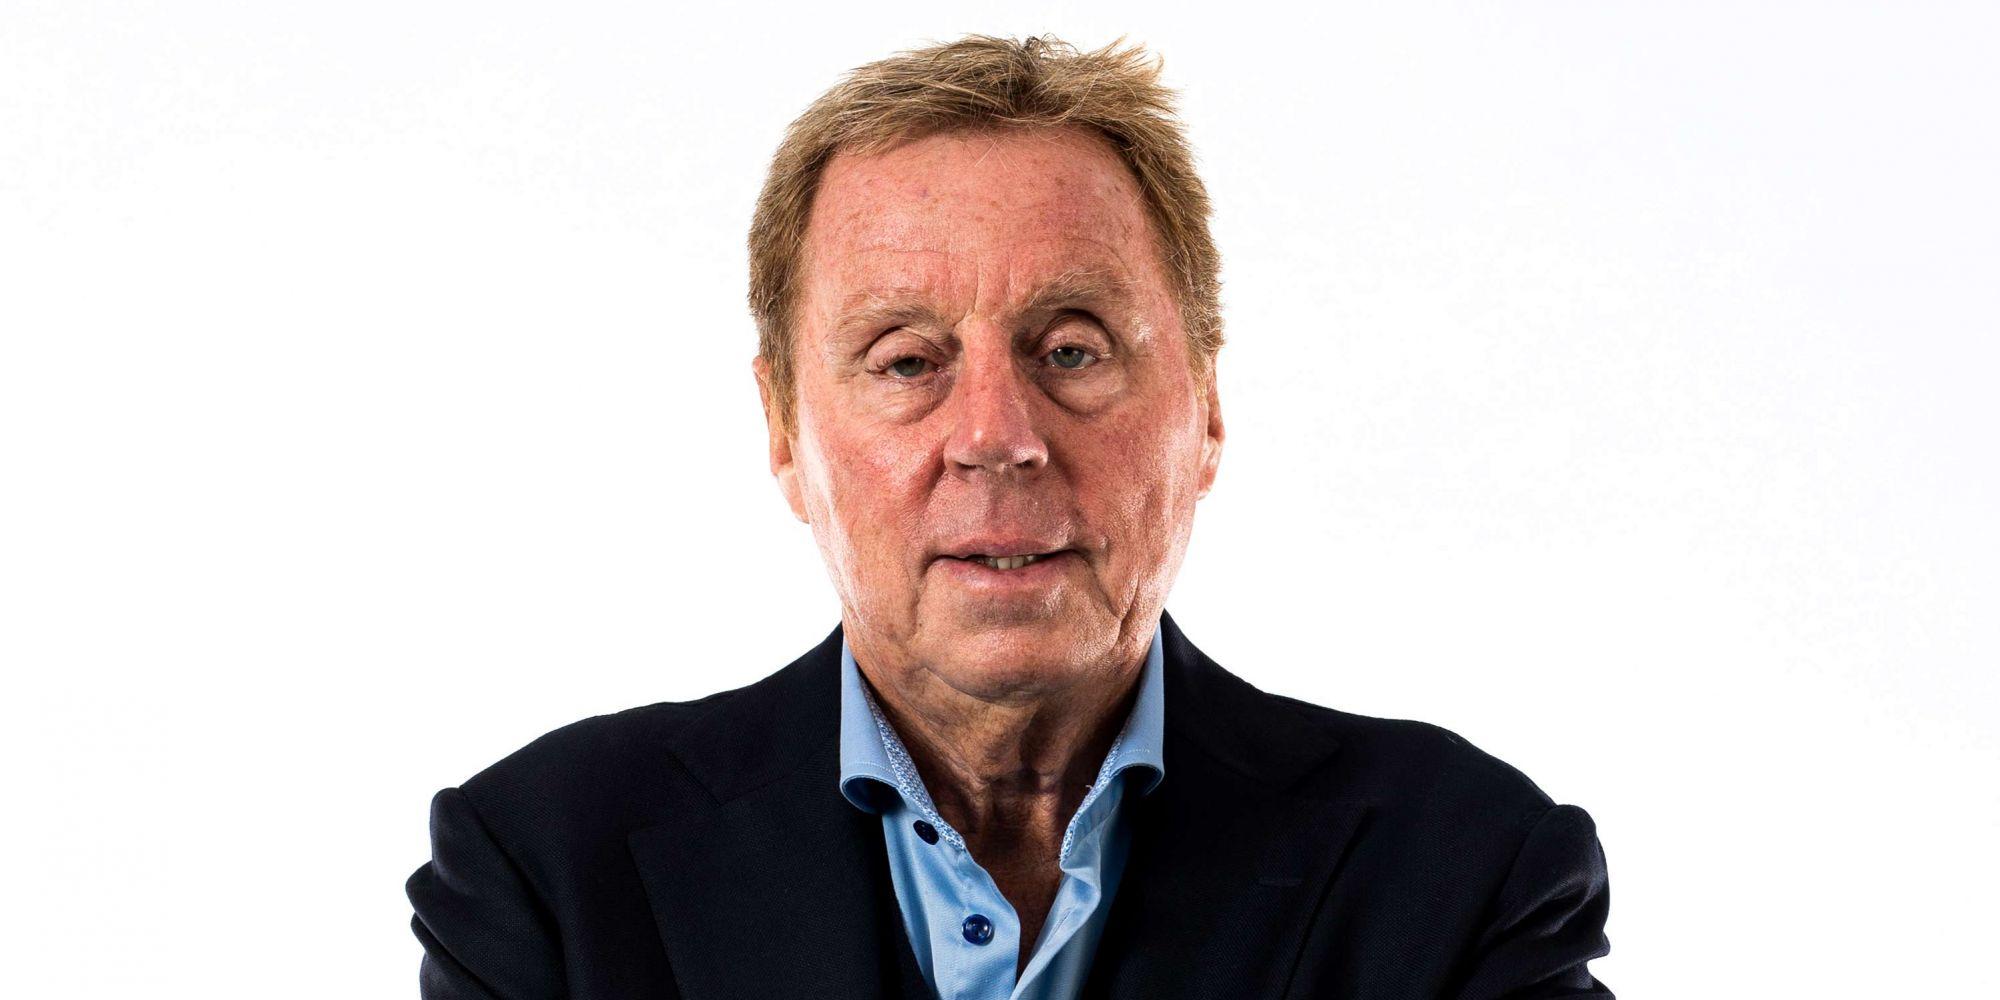 Redknapp Yakin Timnas Inggris Dapat Menangkan Turnamen